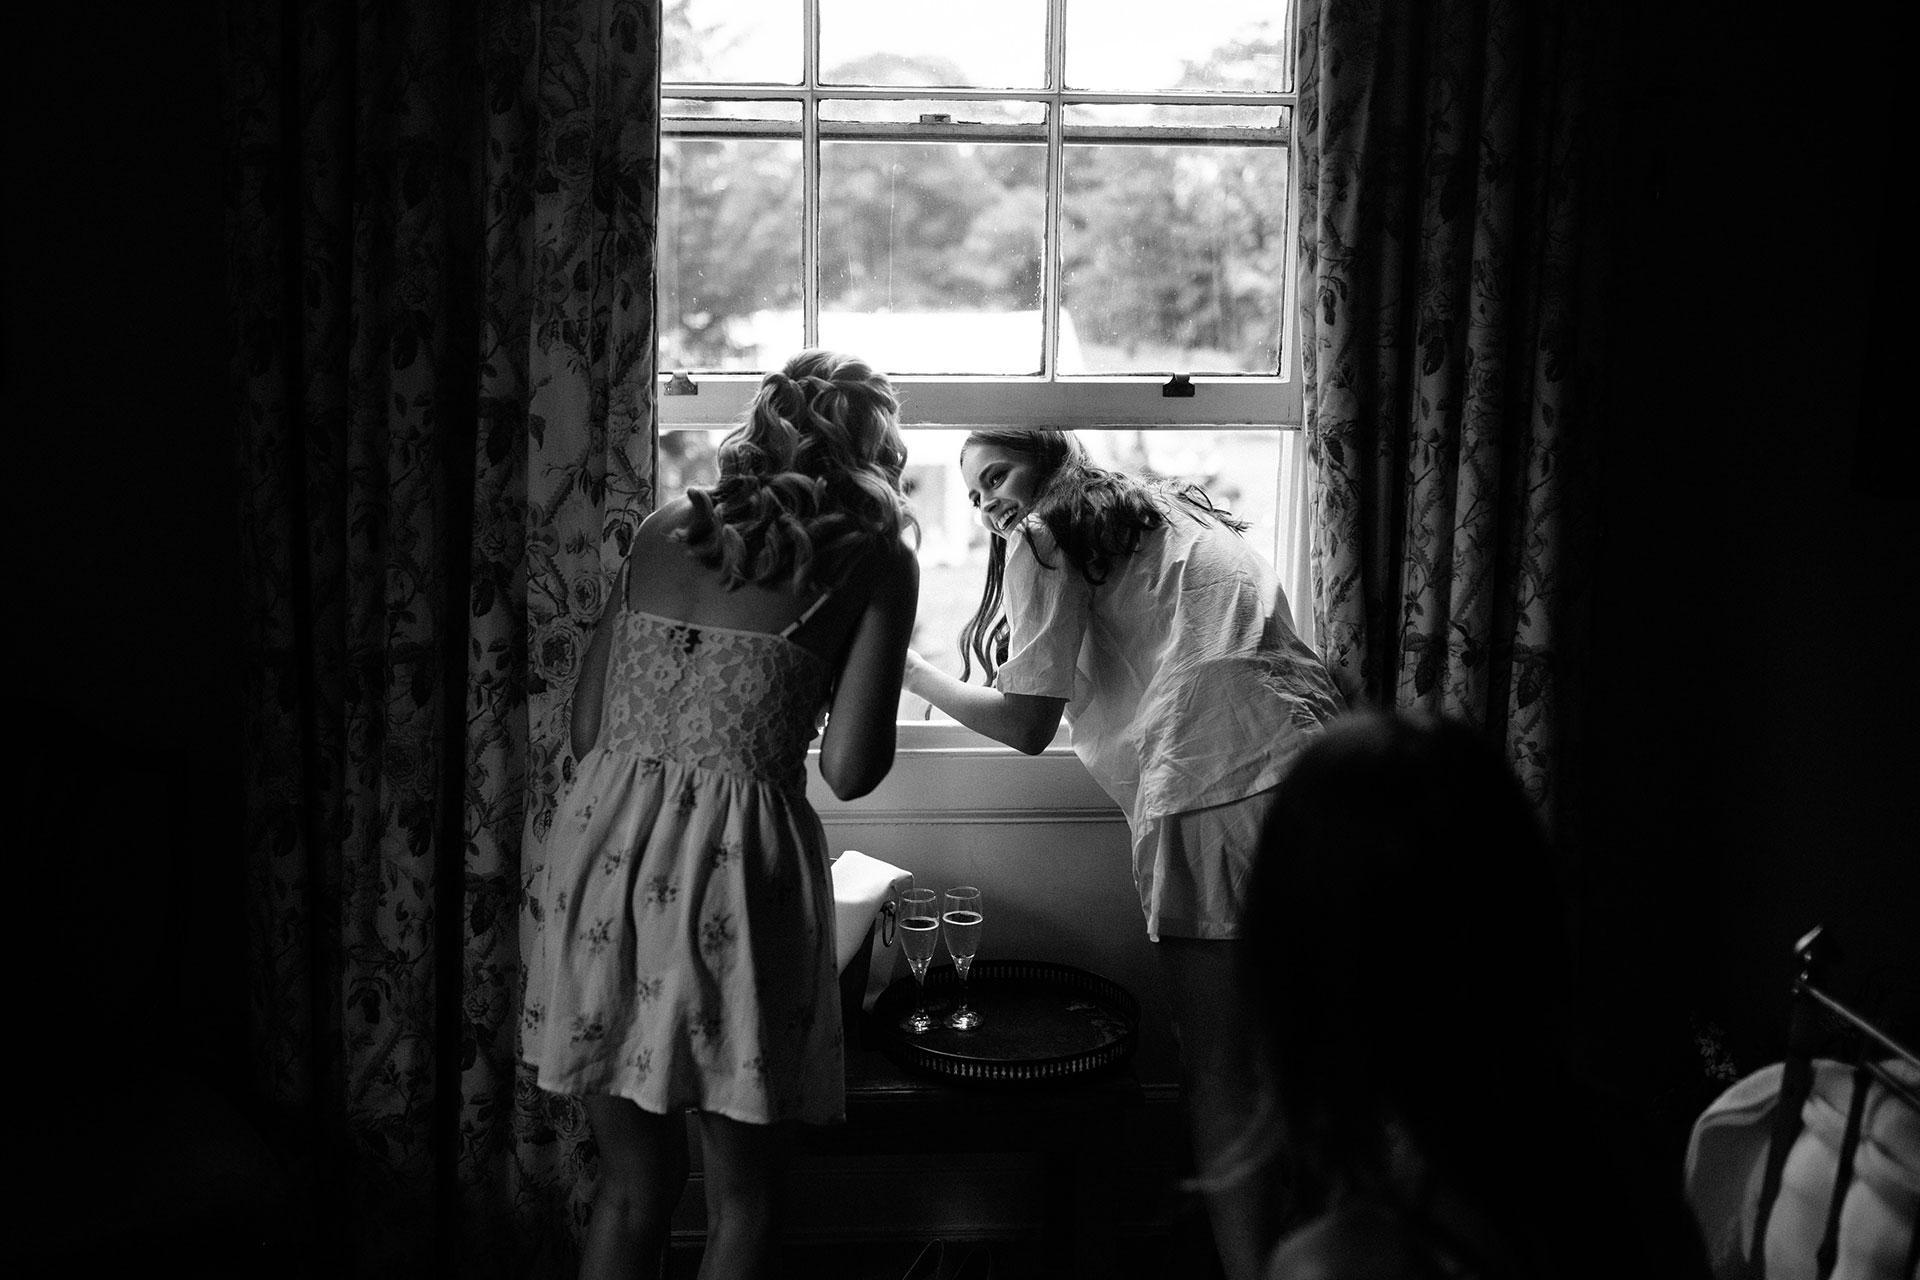 Langar-Hall-wedding-photographer-in-Nottinghamshire-Michael-Newington-Gray-18.jpg